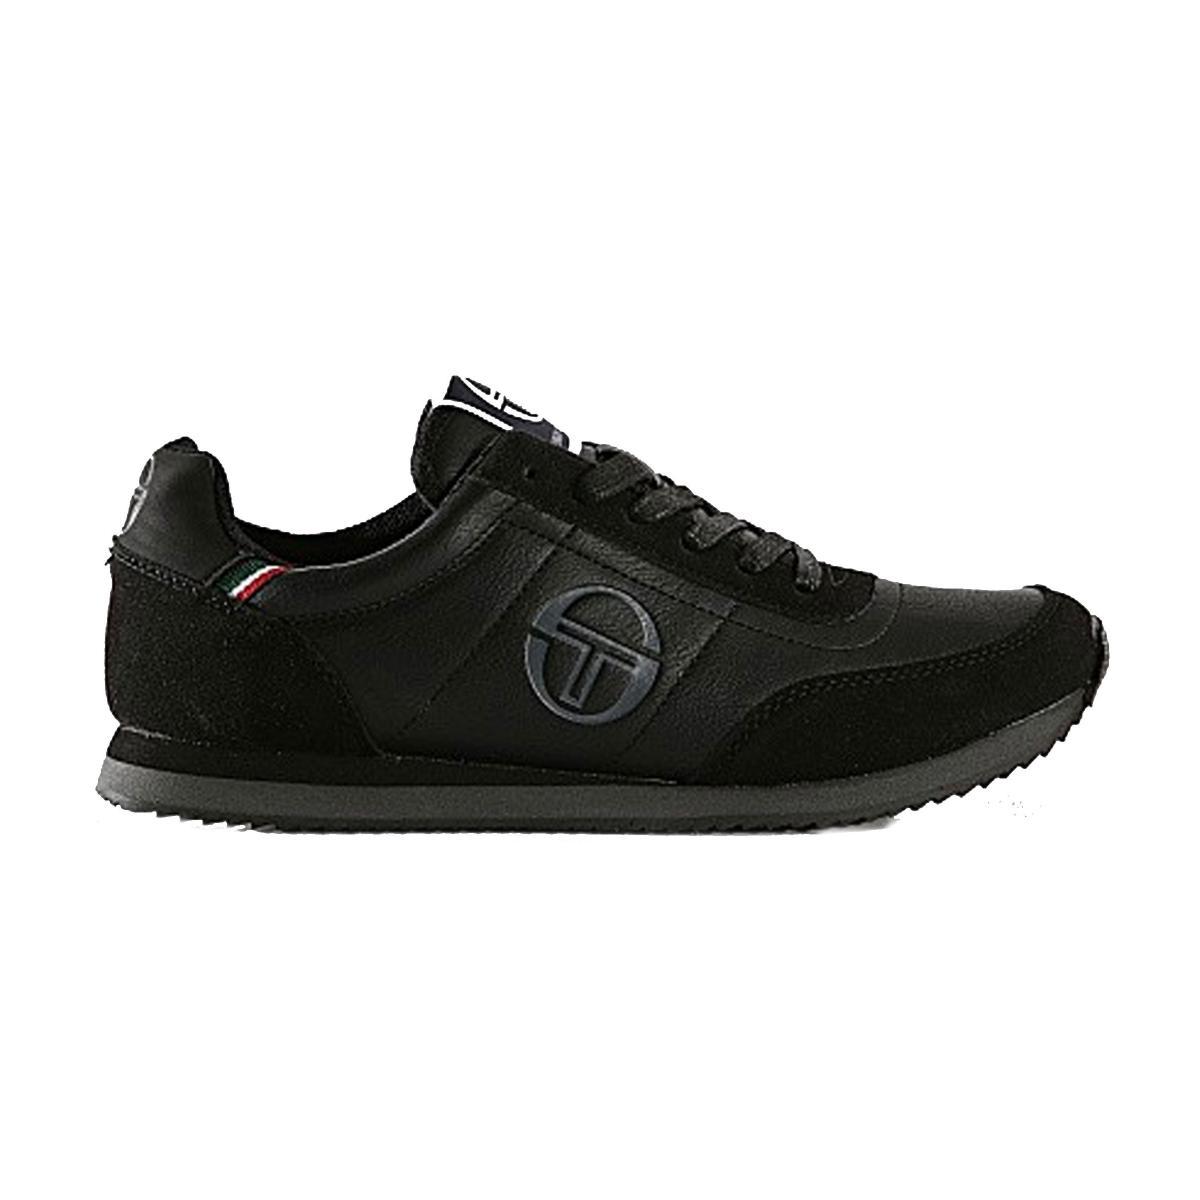 Scarpe Sneakers Sergio Tacchini NANTES MIX da uomo rif. STM923210